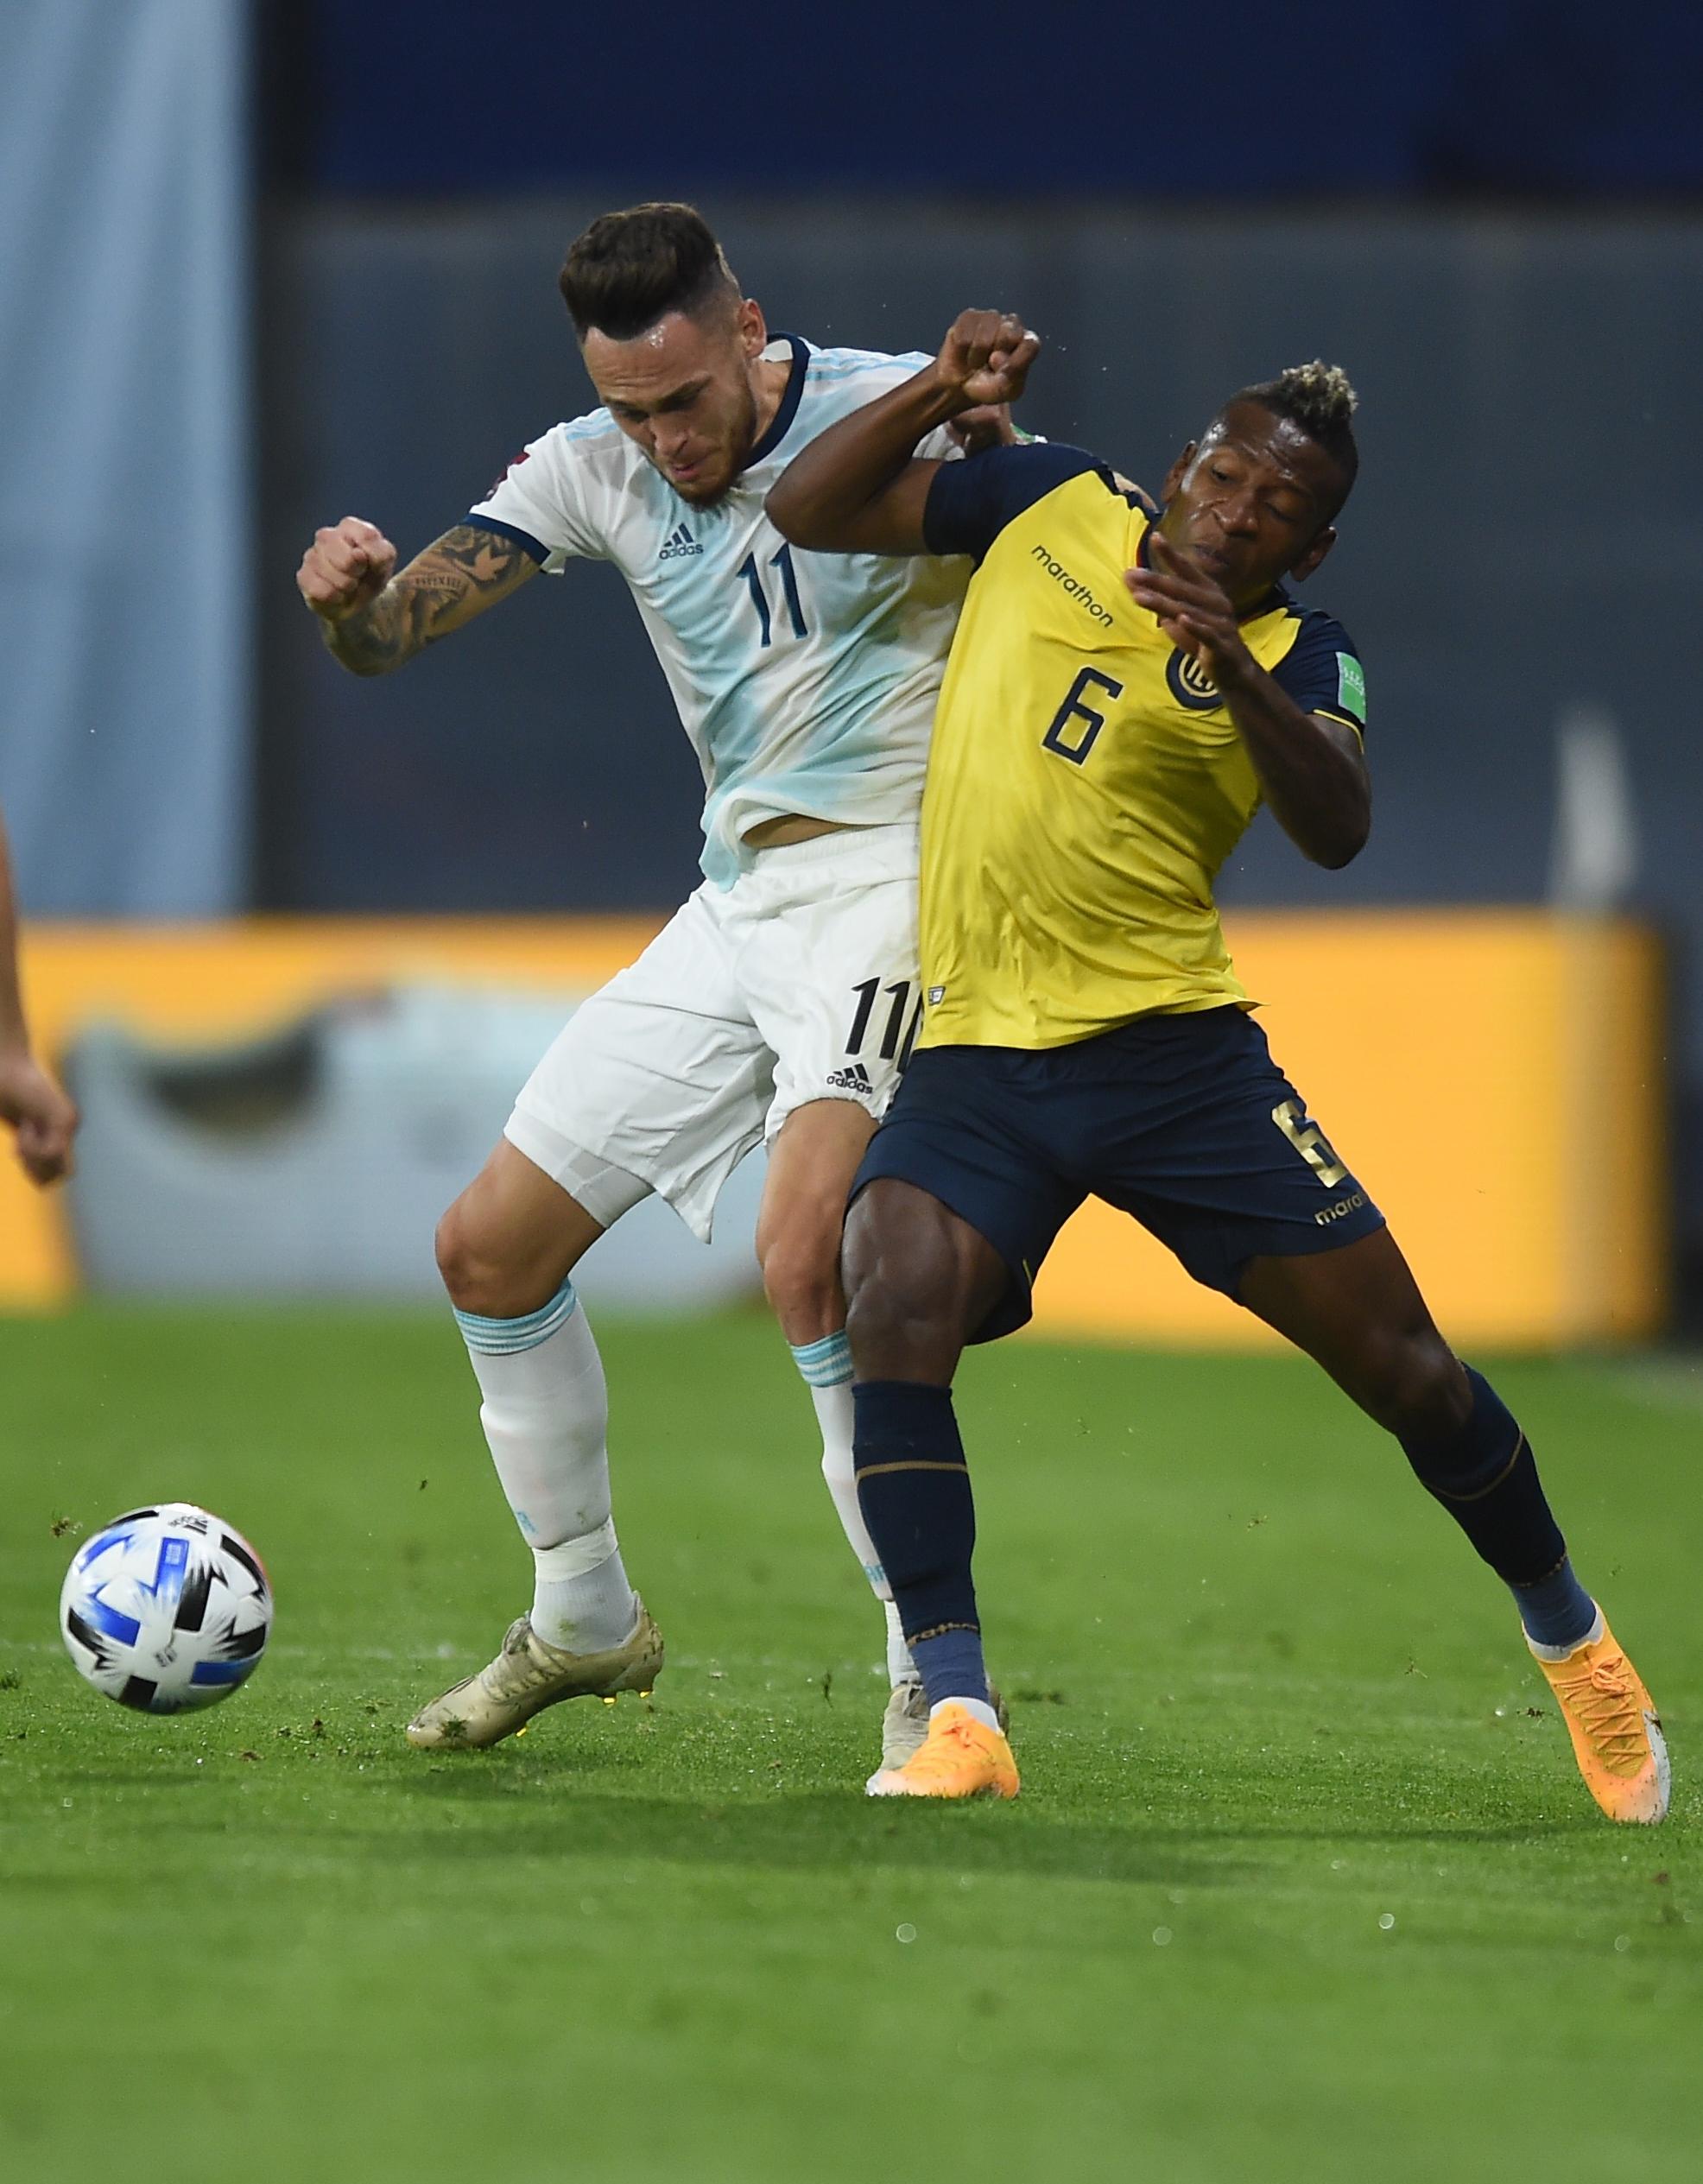 Ocampos lucha por el balón con Estupiñán: duelo entre dos jugadores de la Liga de España (REUTERS/Marcelo Endelli)